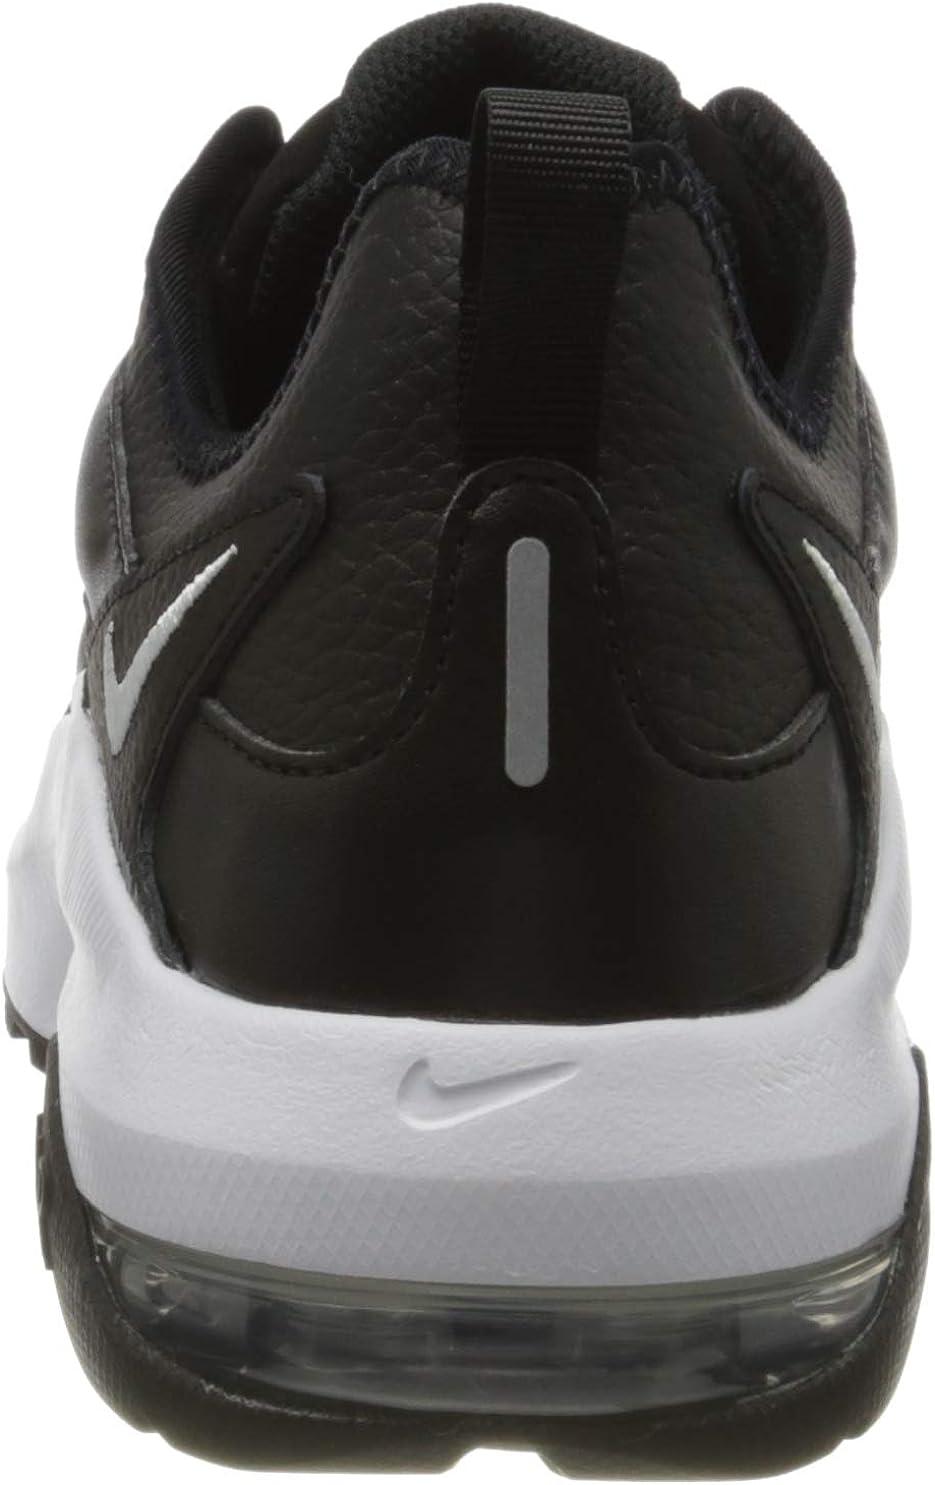 Nike Air Max Graviton Lea, Sneakers Basses Homme Noir Black White 101